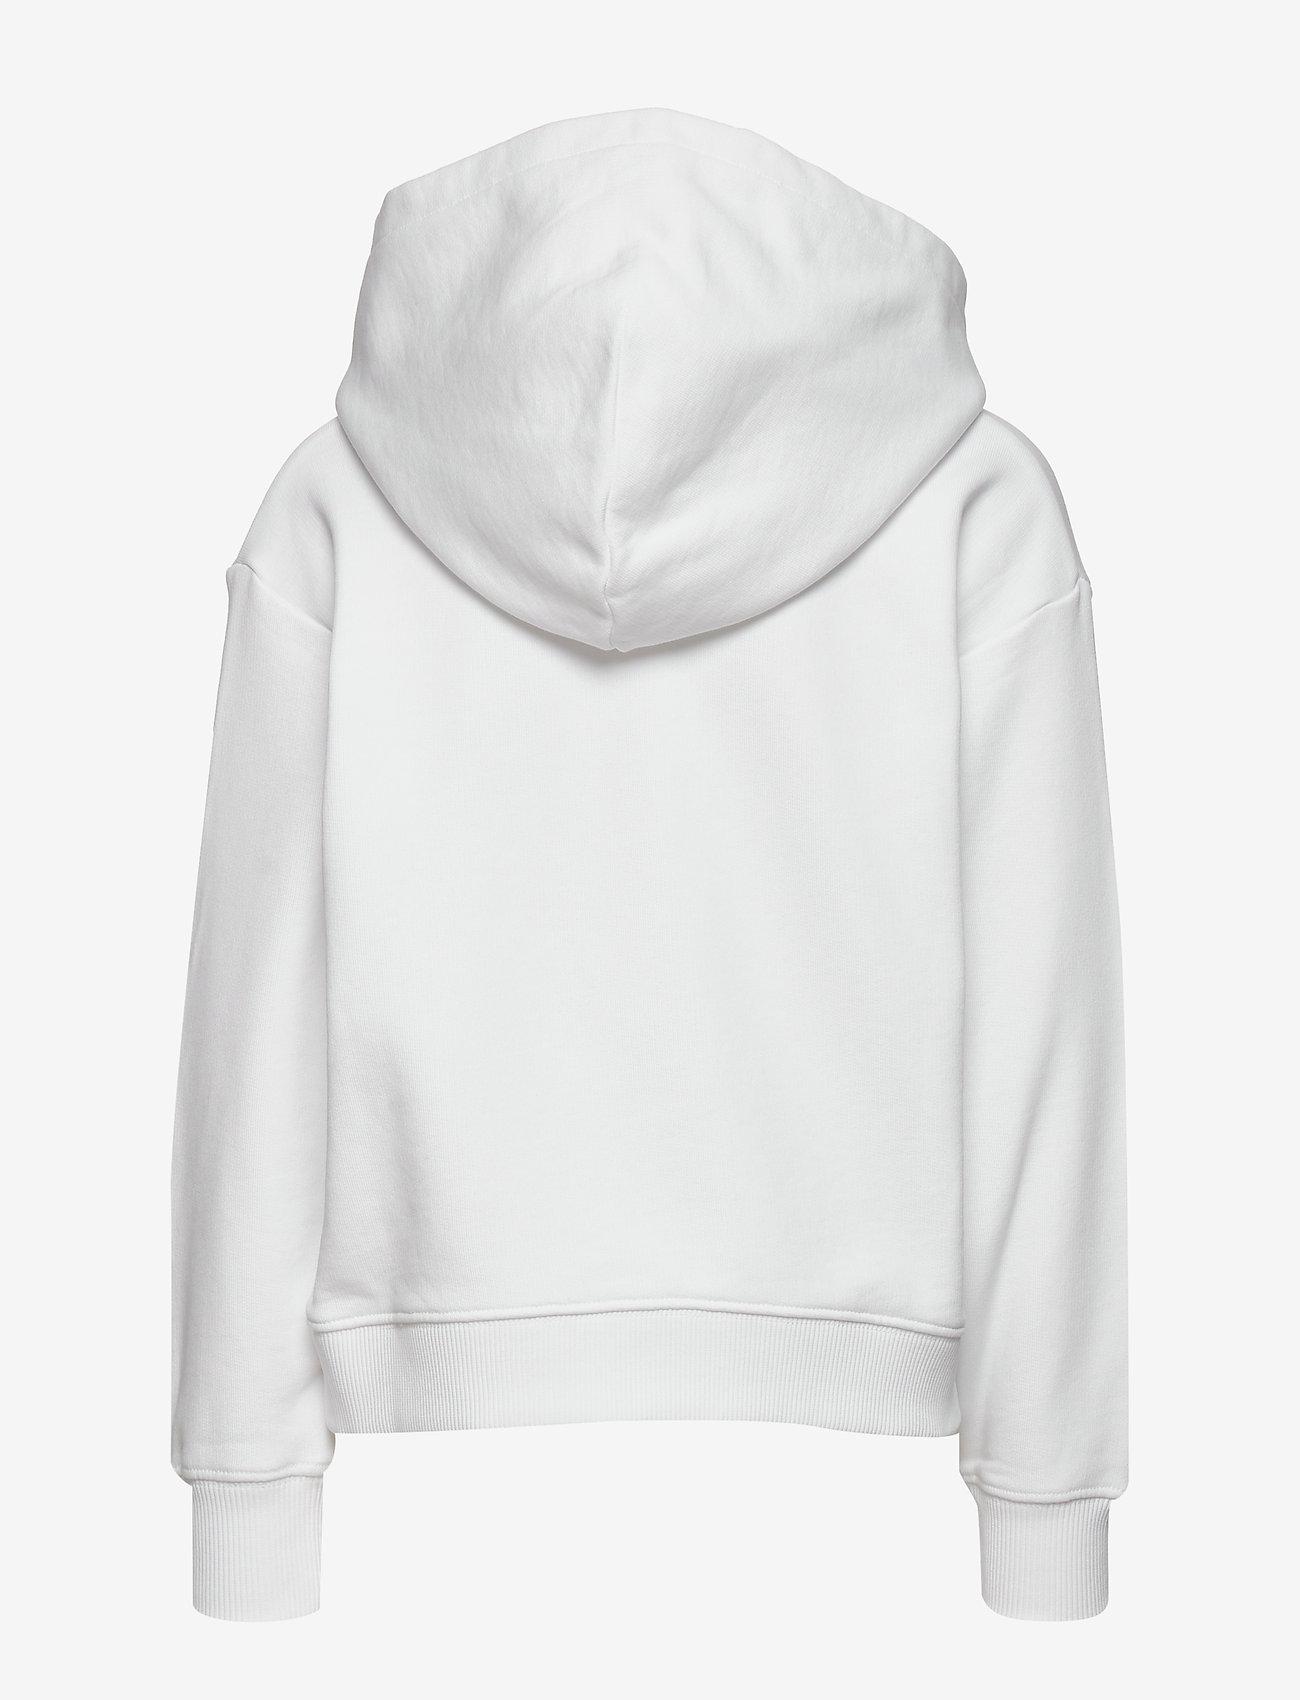 Calvin Klein - IRIDESCENT LOGO HOODIE - hoodies - bright white - 1